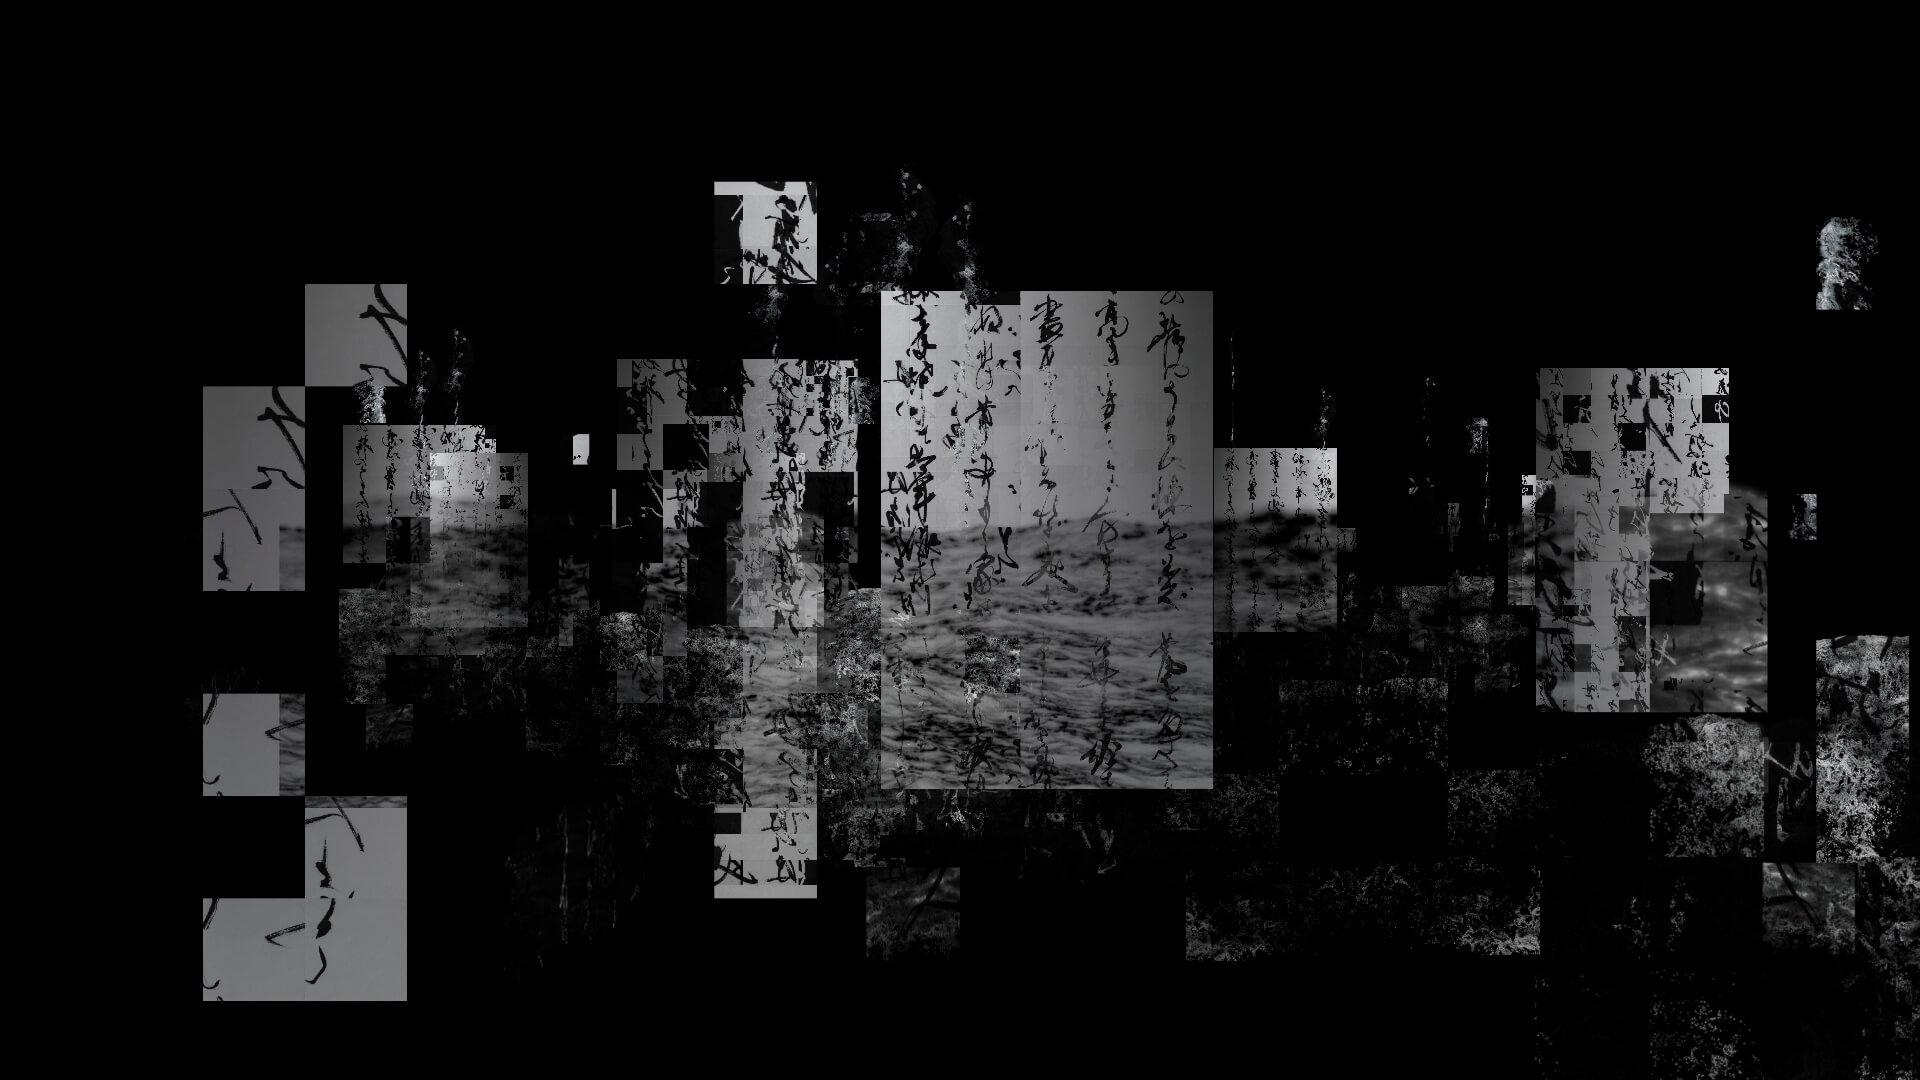 <Japan Media Arts Distributed Museum ETERNAL ~千秒の清寂>が羽田空港国際線ターミナルで開催!KyokaやTETSUJI OHNOらも作品に参加 ac200127_eternal_07